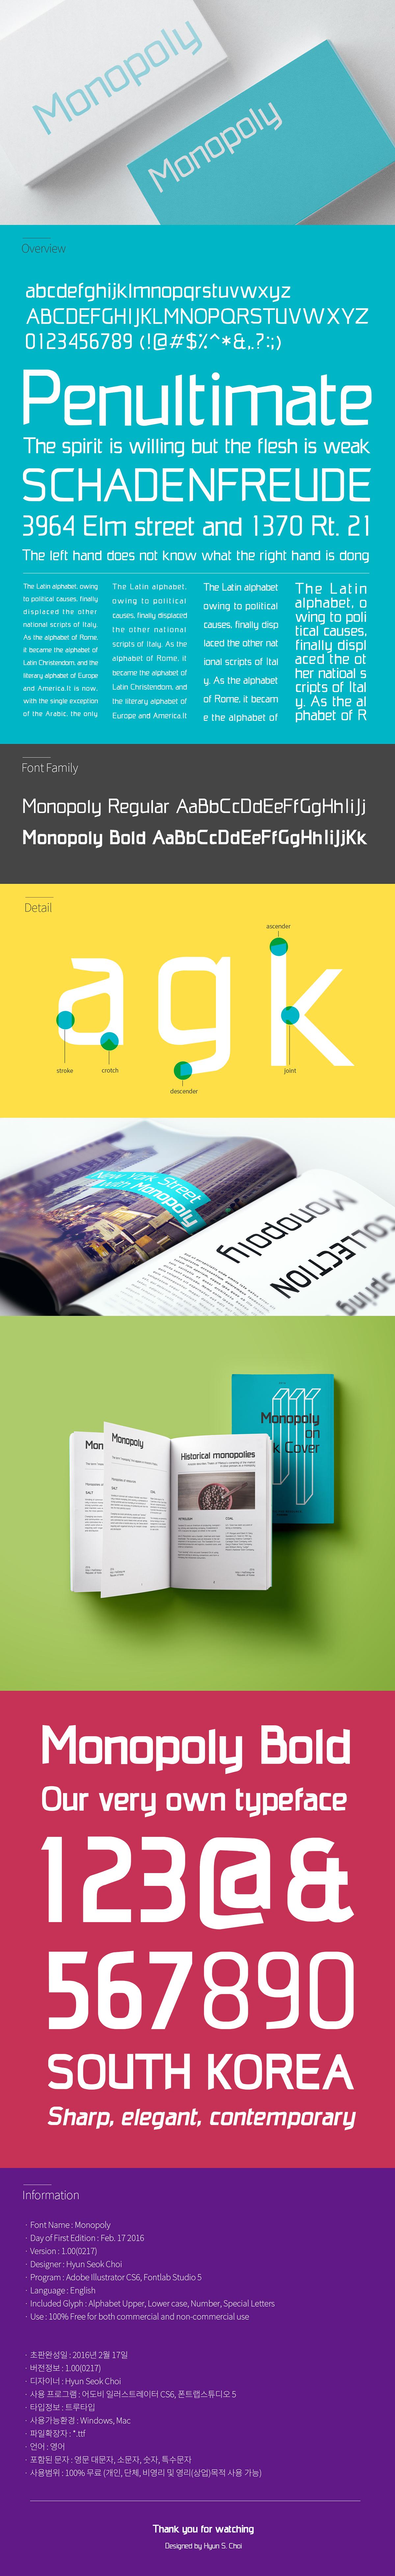 Monopoly Free Font Preview